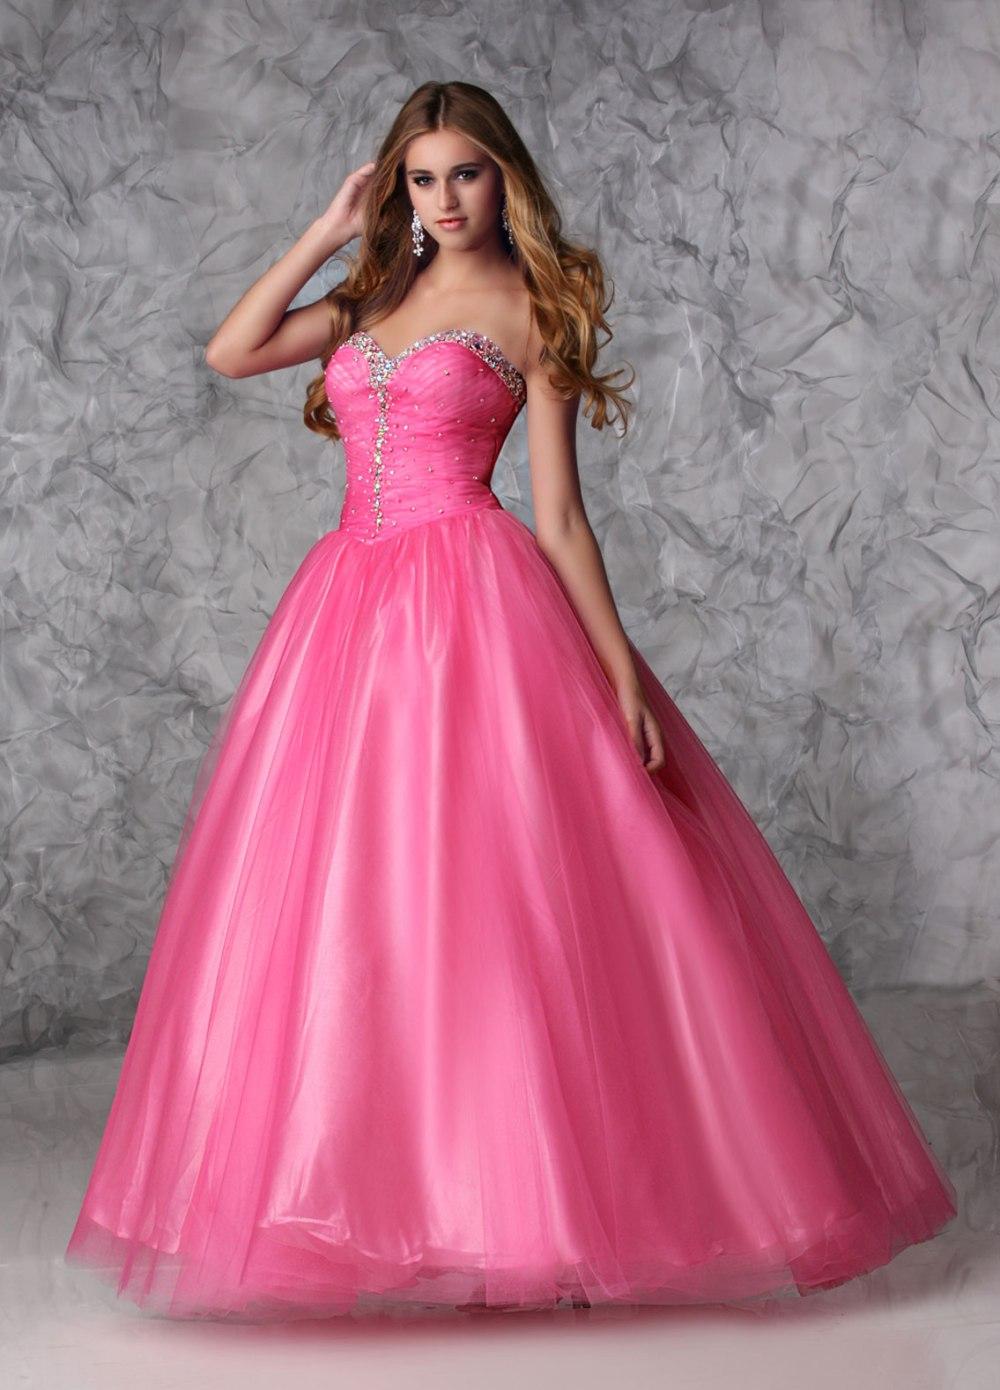 3 of 101 best 2013 prom dresses.